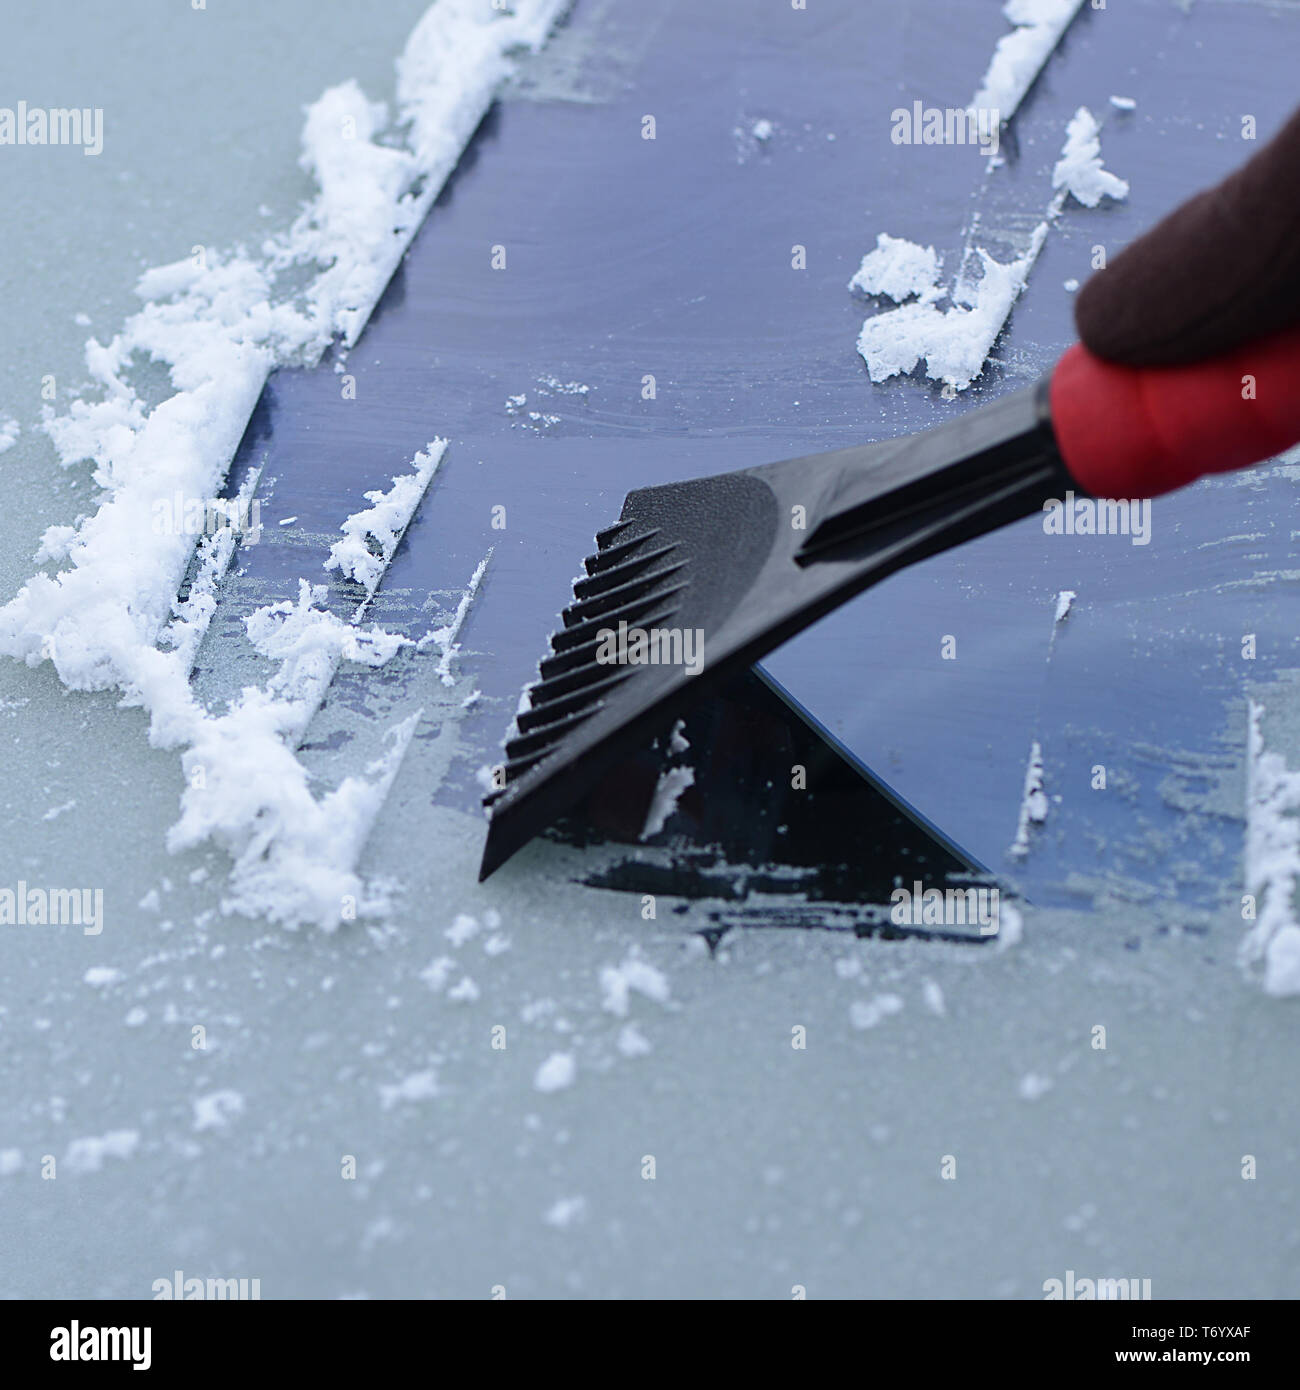 Ice Scraper 9 - Stock Image